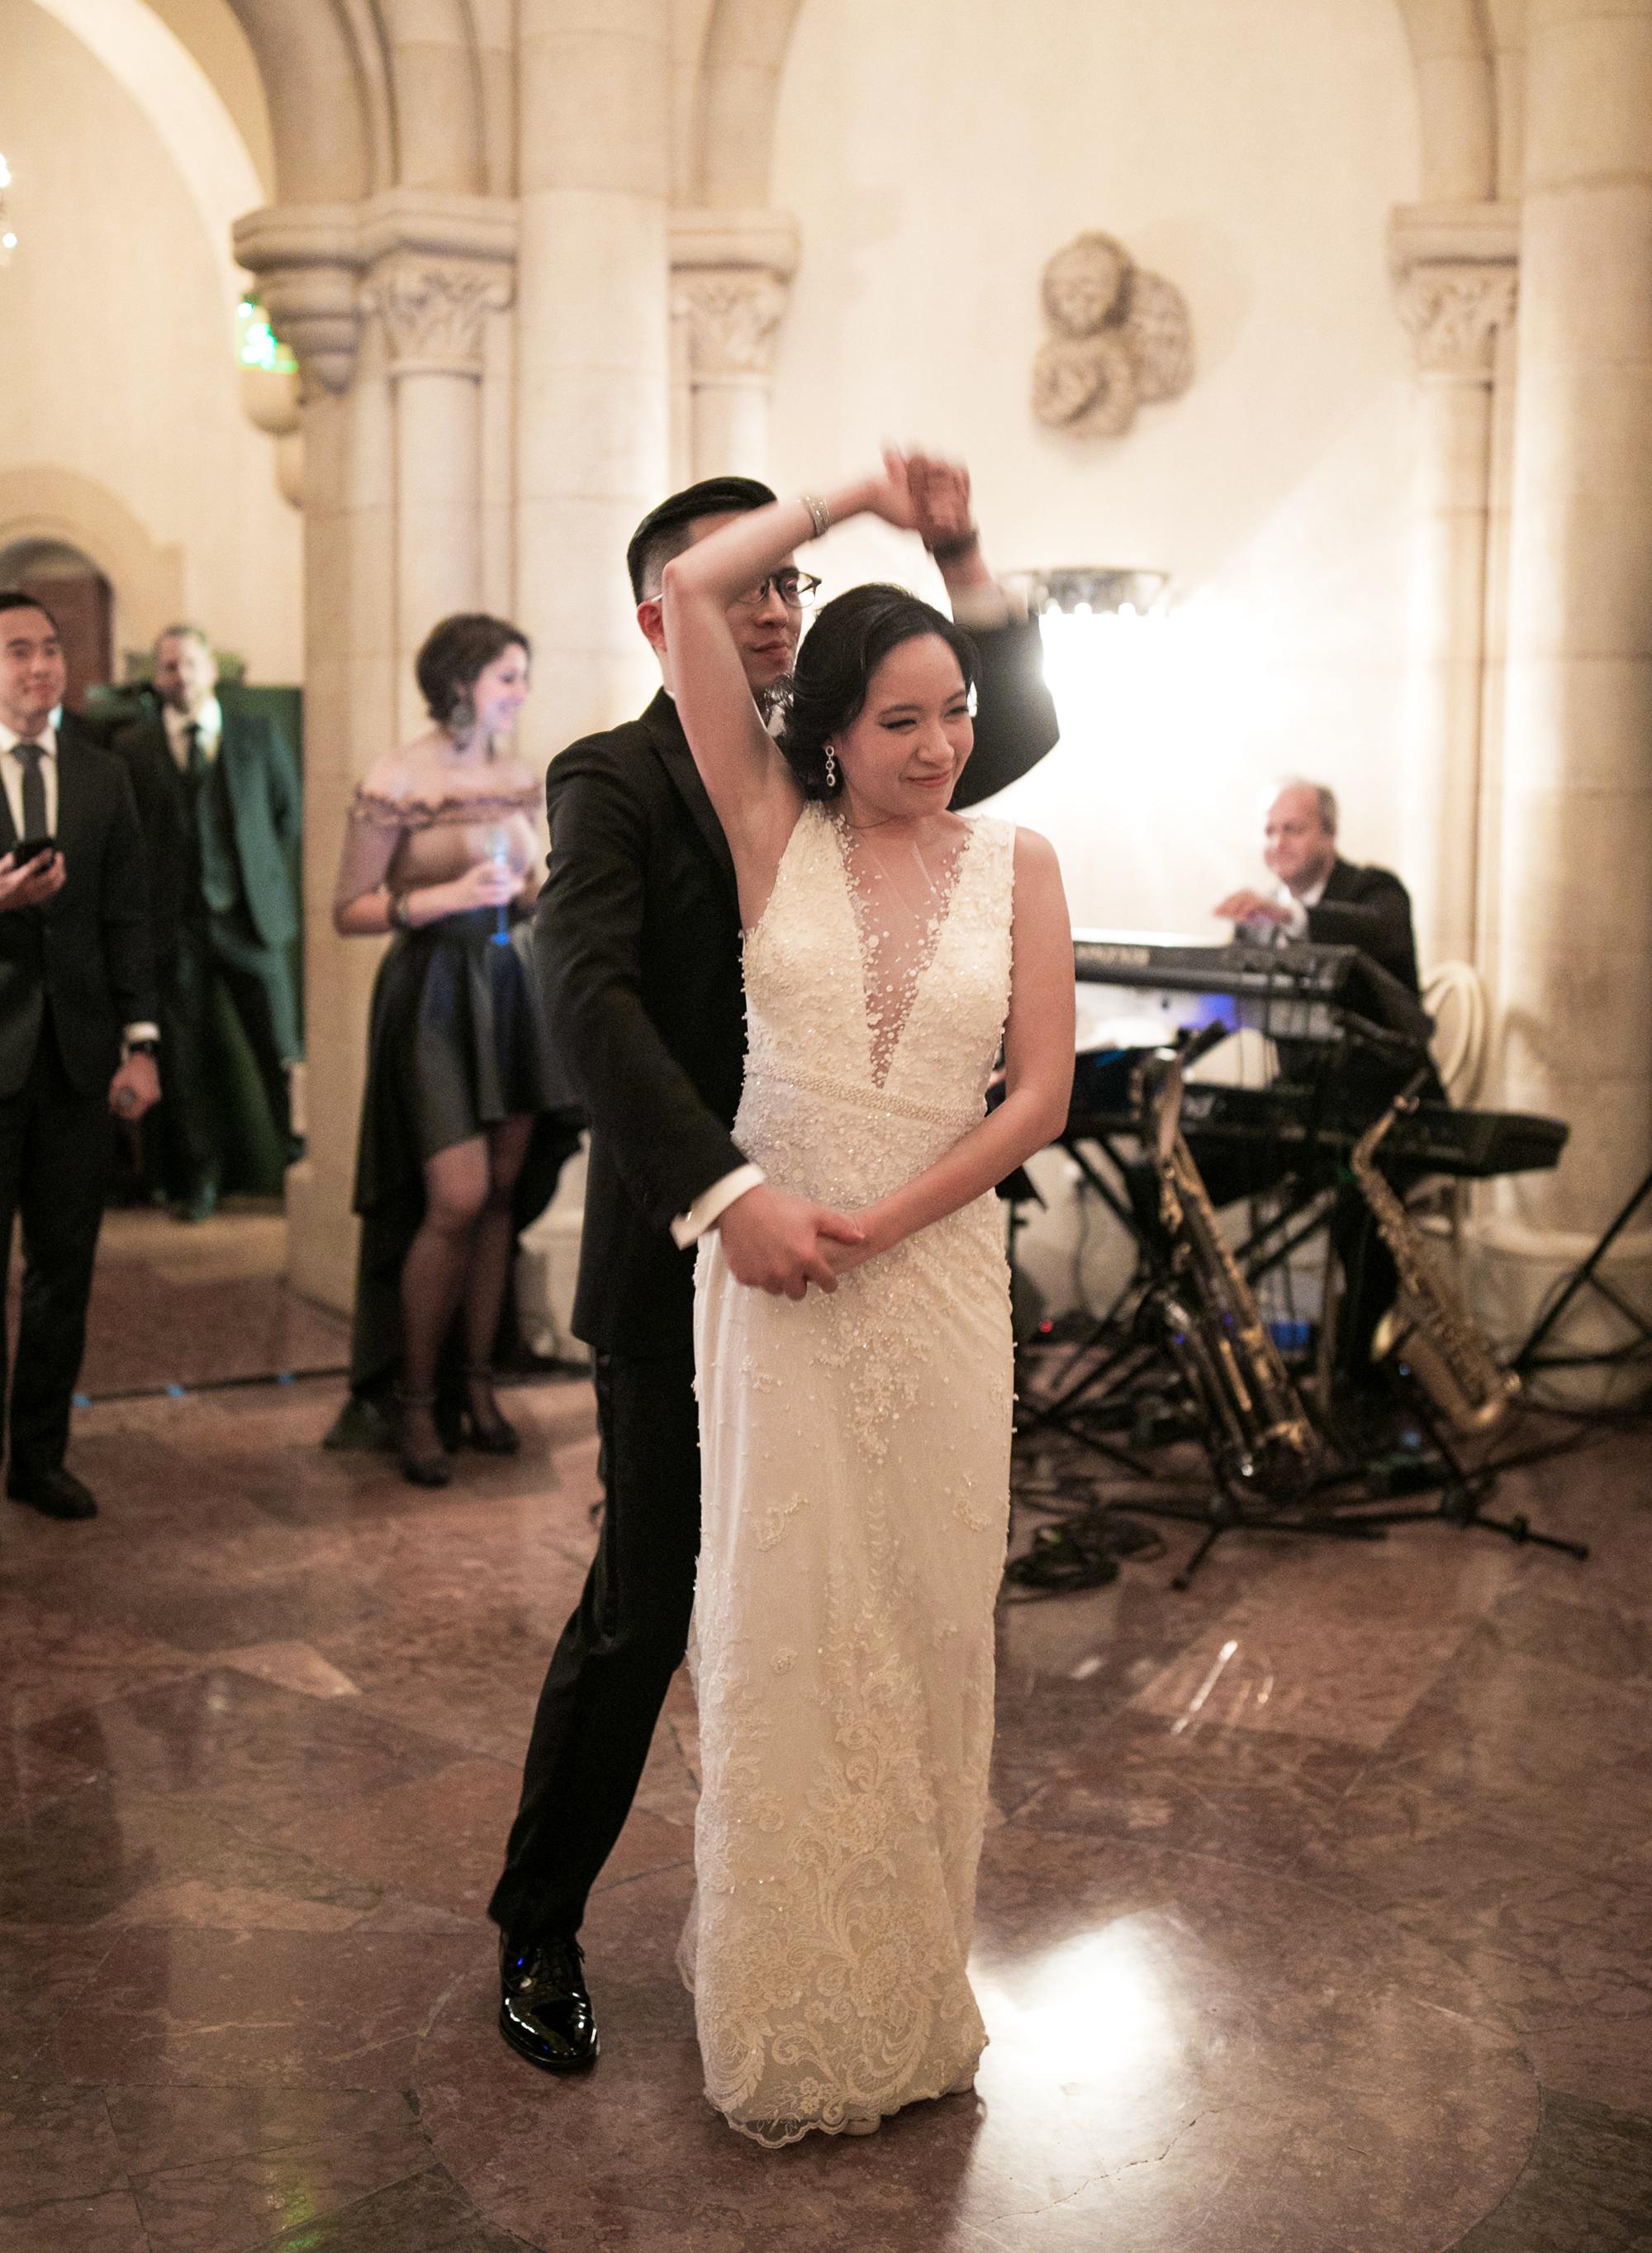 diana alex wedding first dance